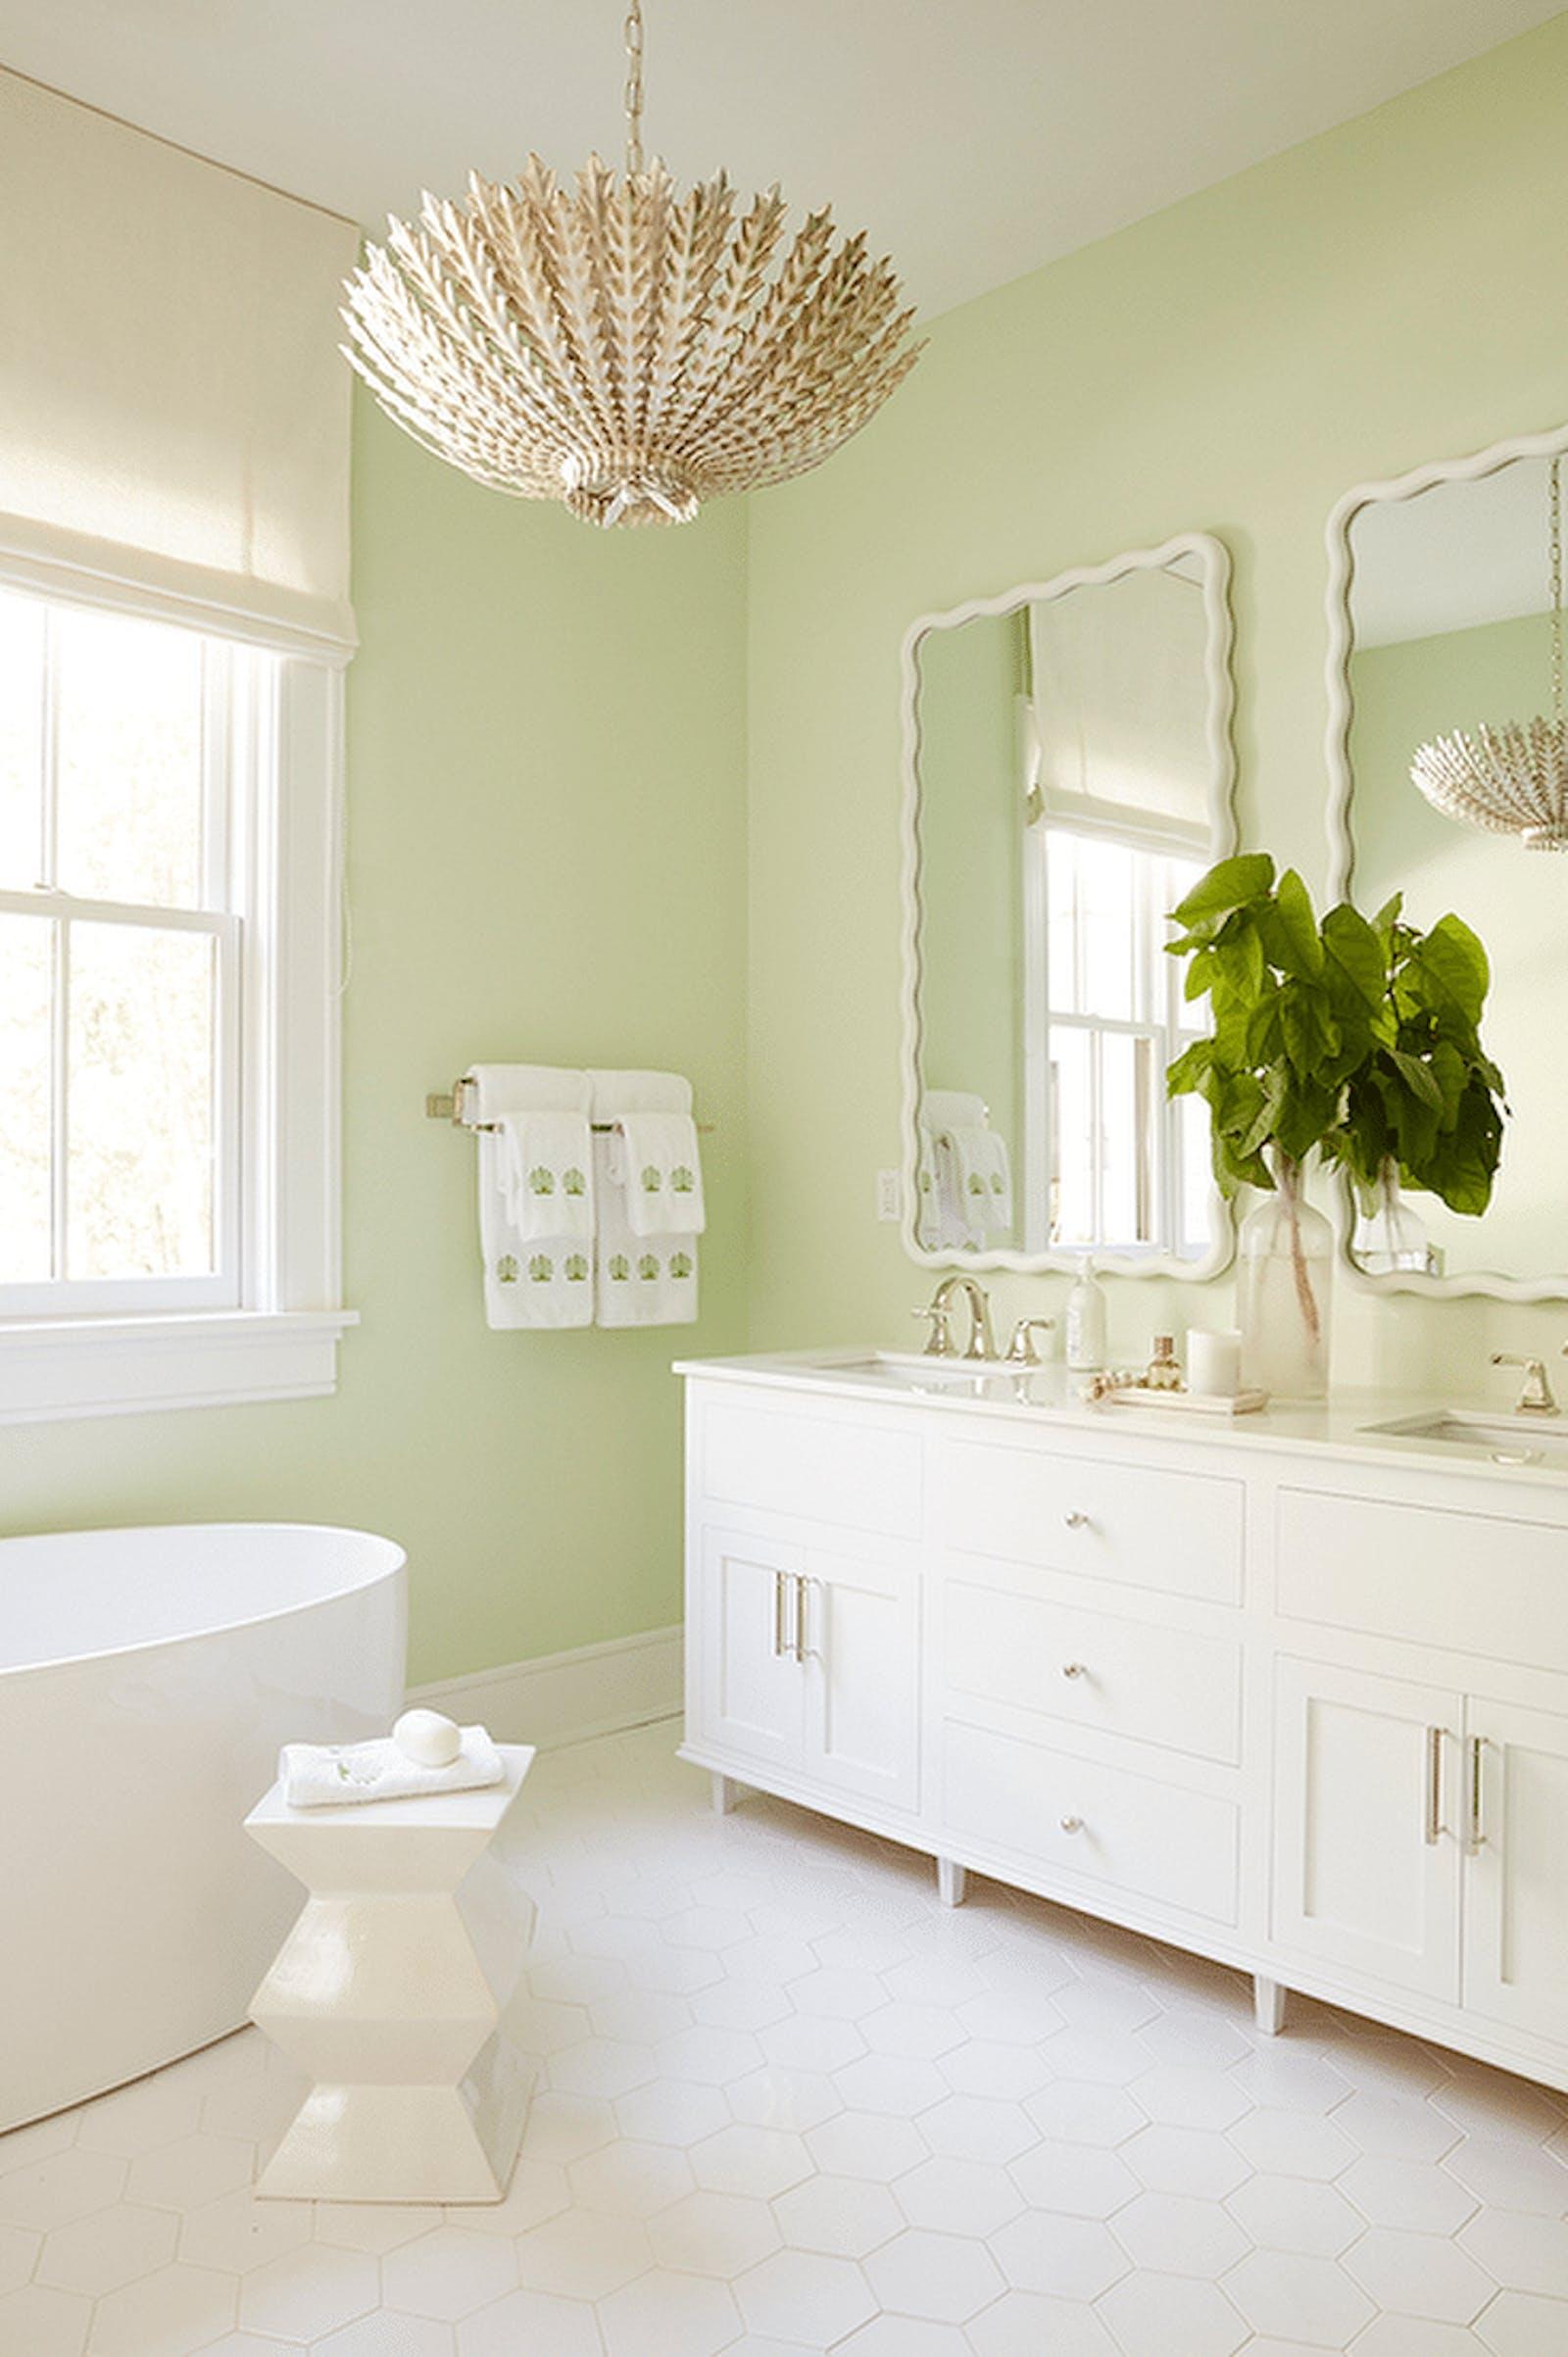 Vintage bathroom in light pastel green colour